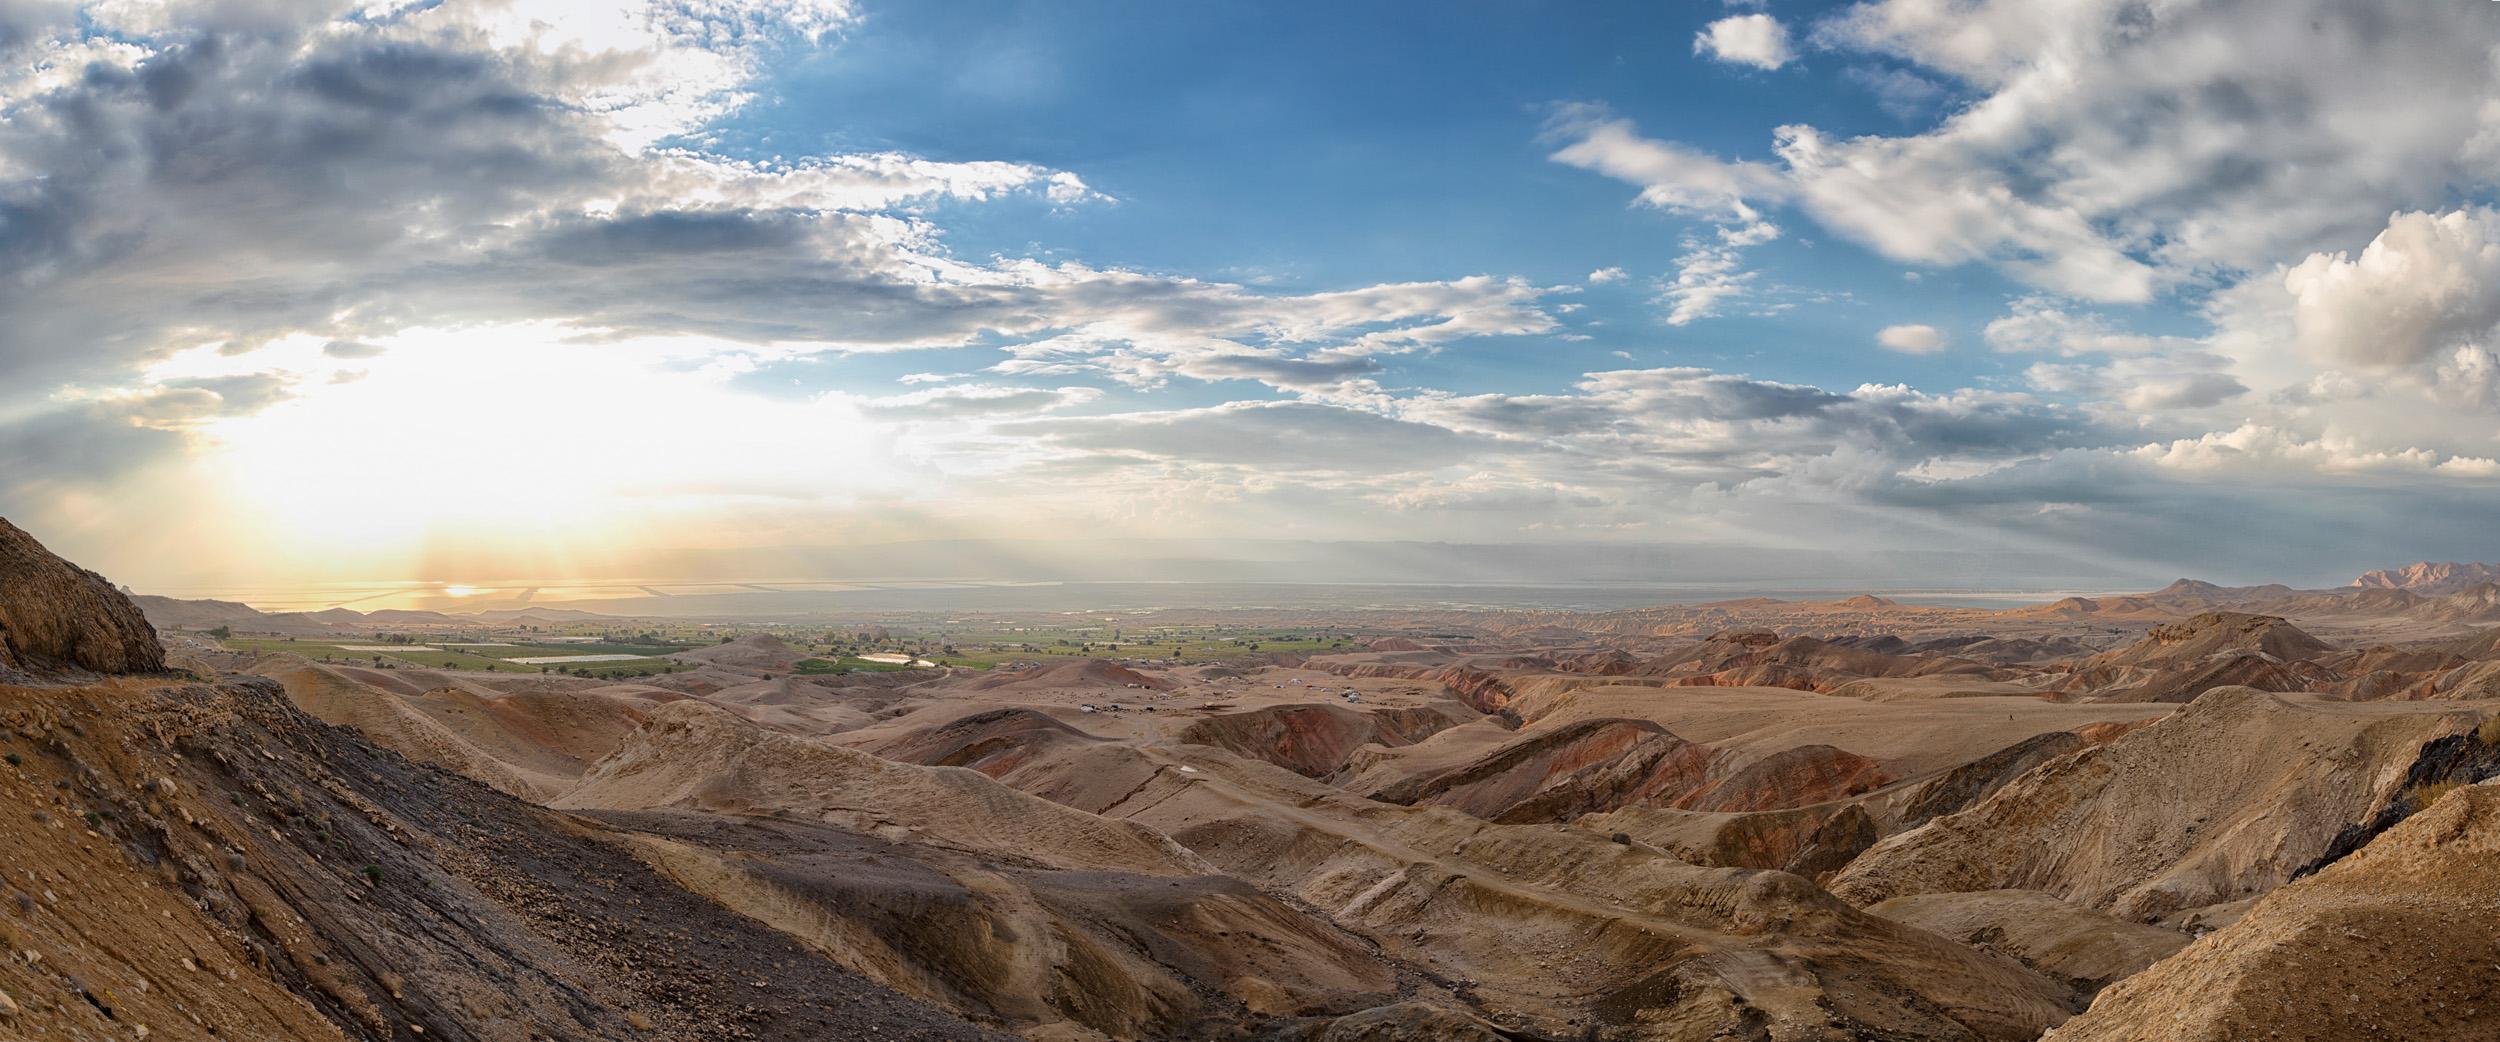 Untitled_Panorama13 crop.jpg